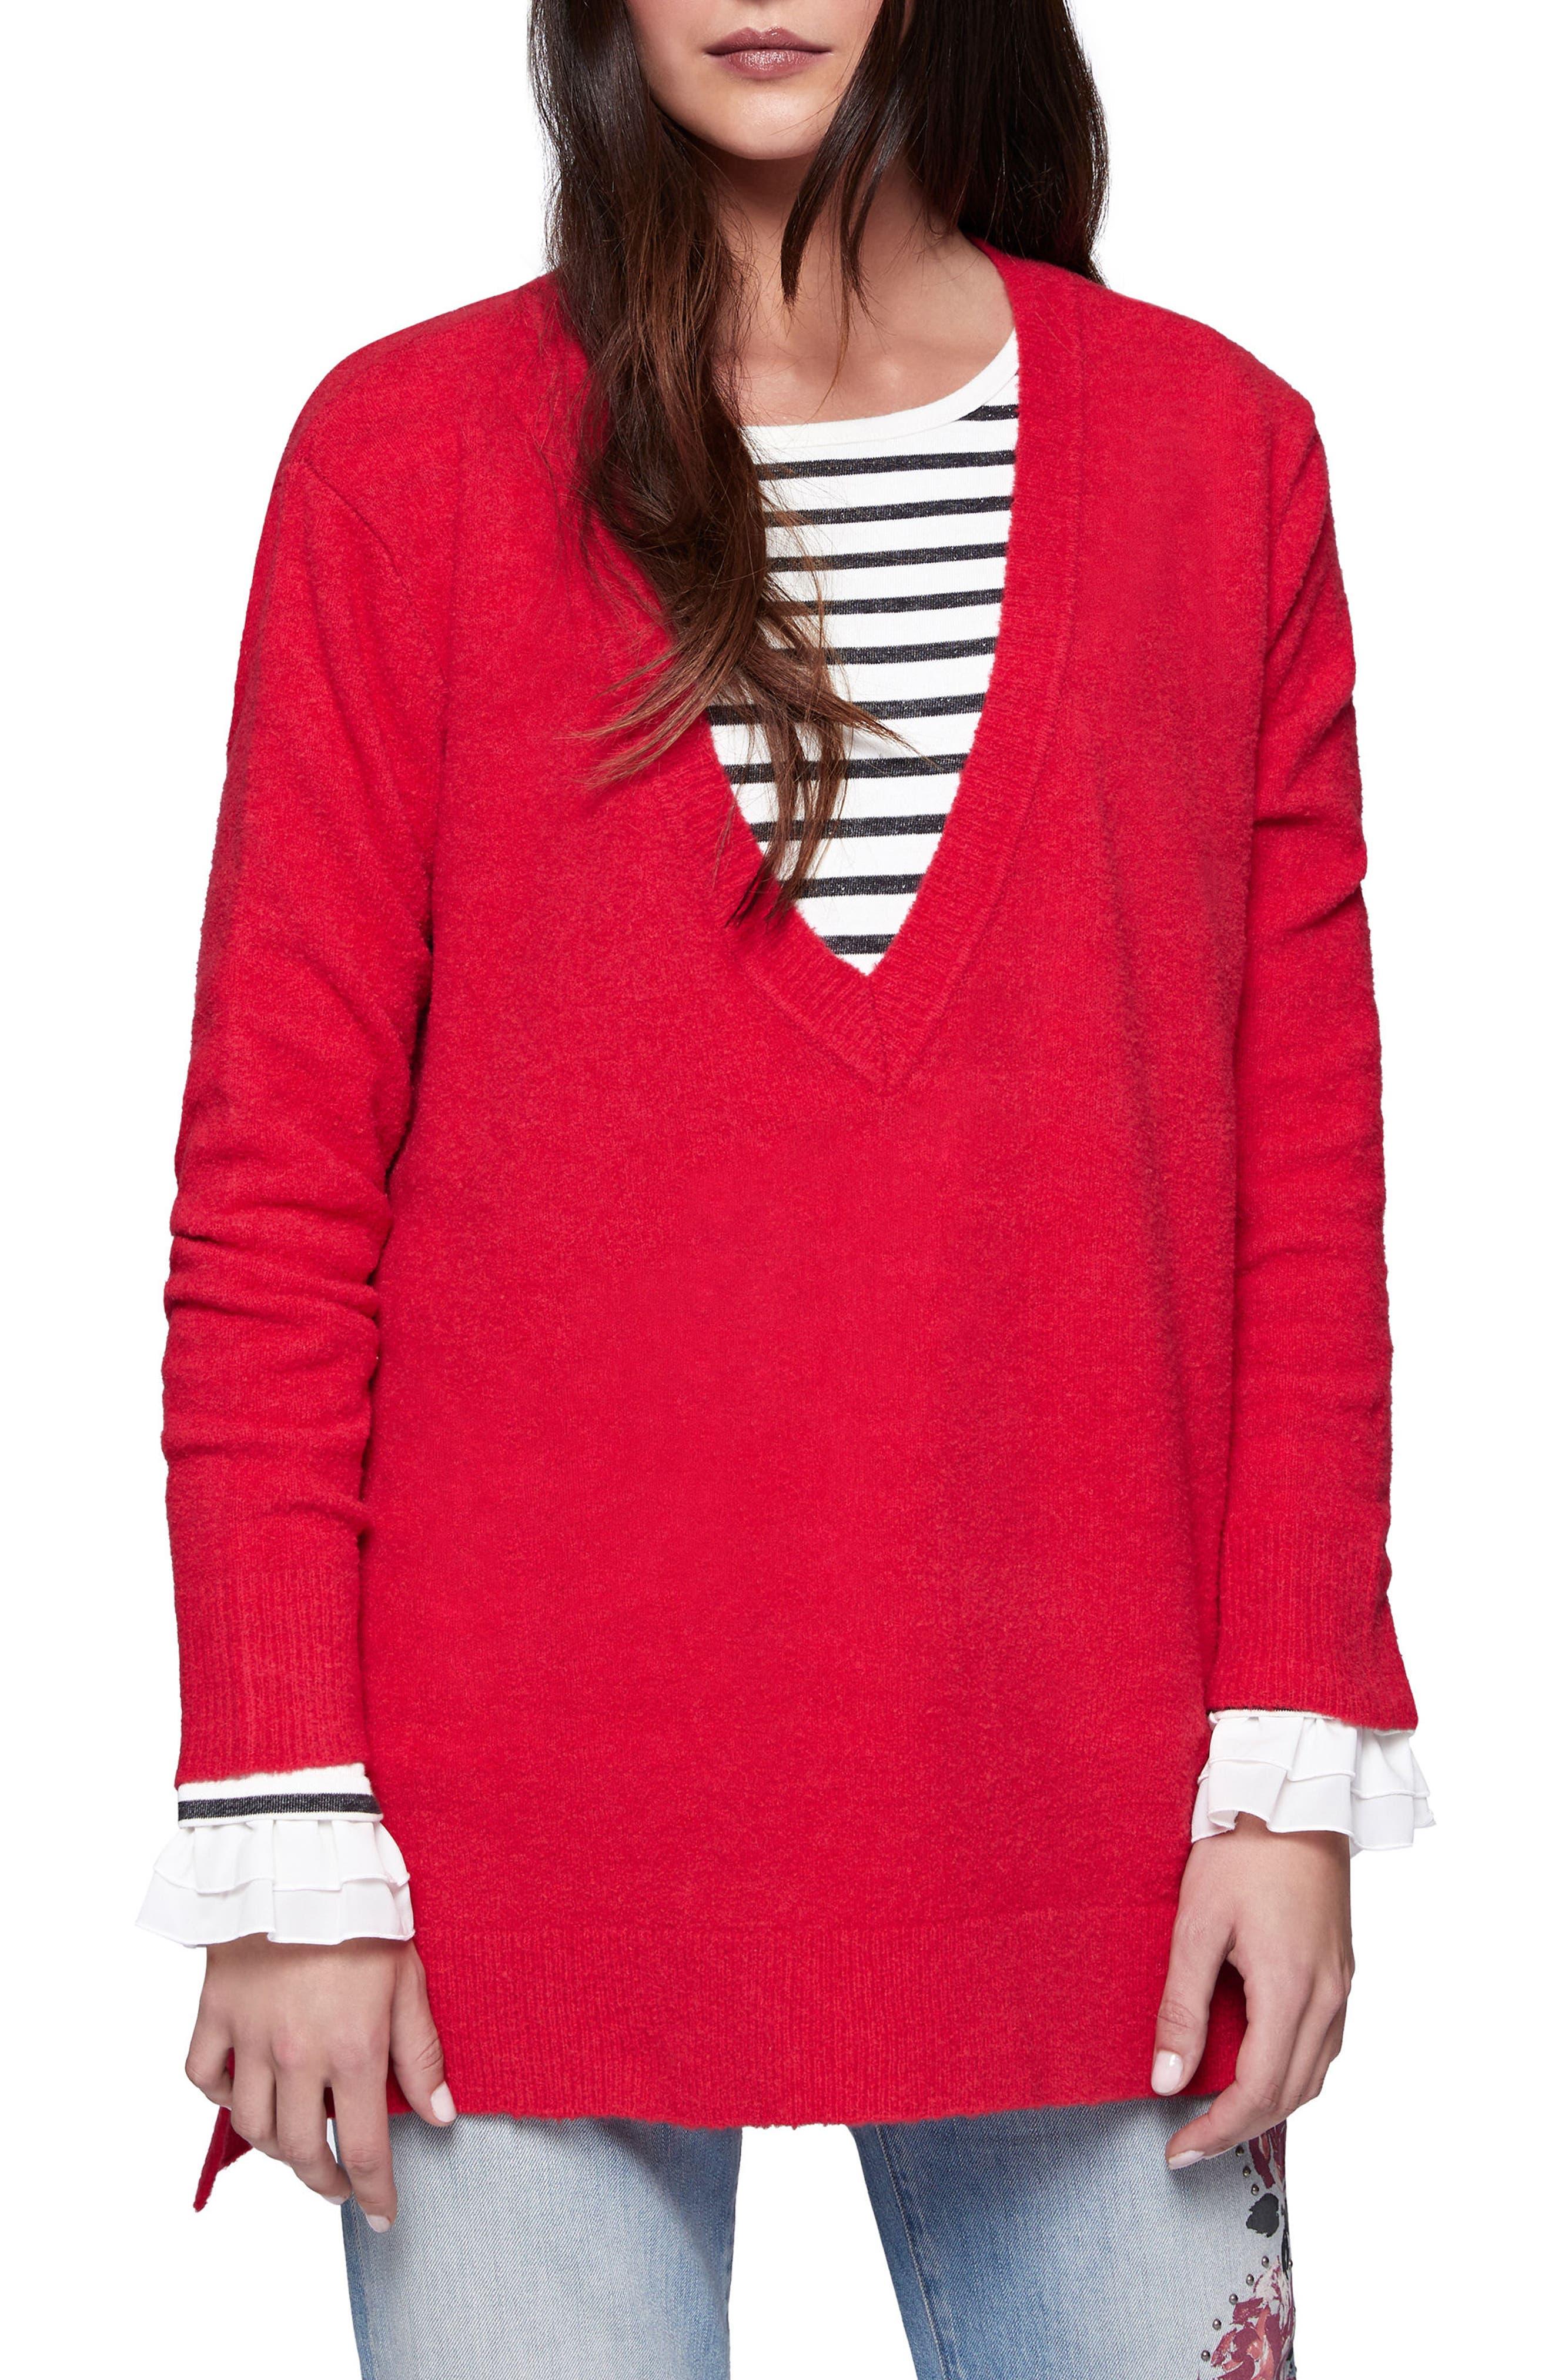 Alternate Image 1 Selected - Santuary Delancey V-Neck Sweater (Regular & Petite)